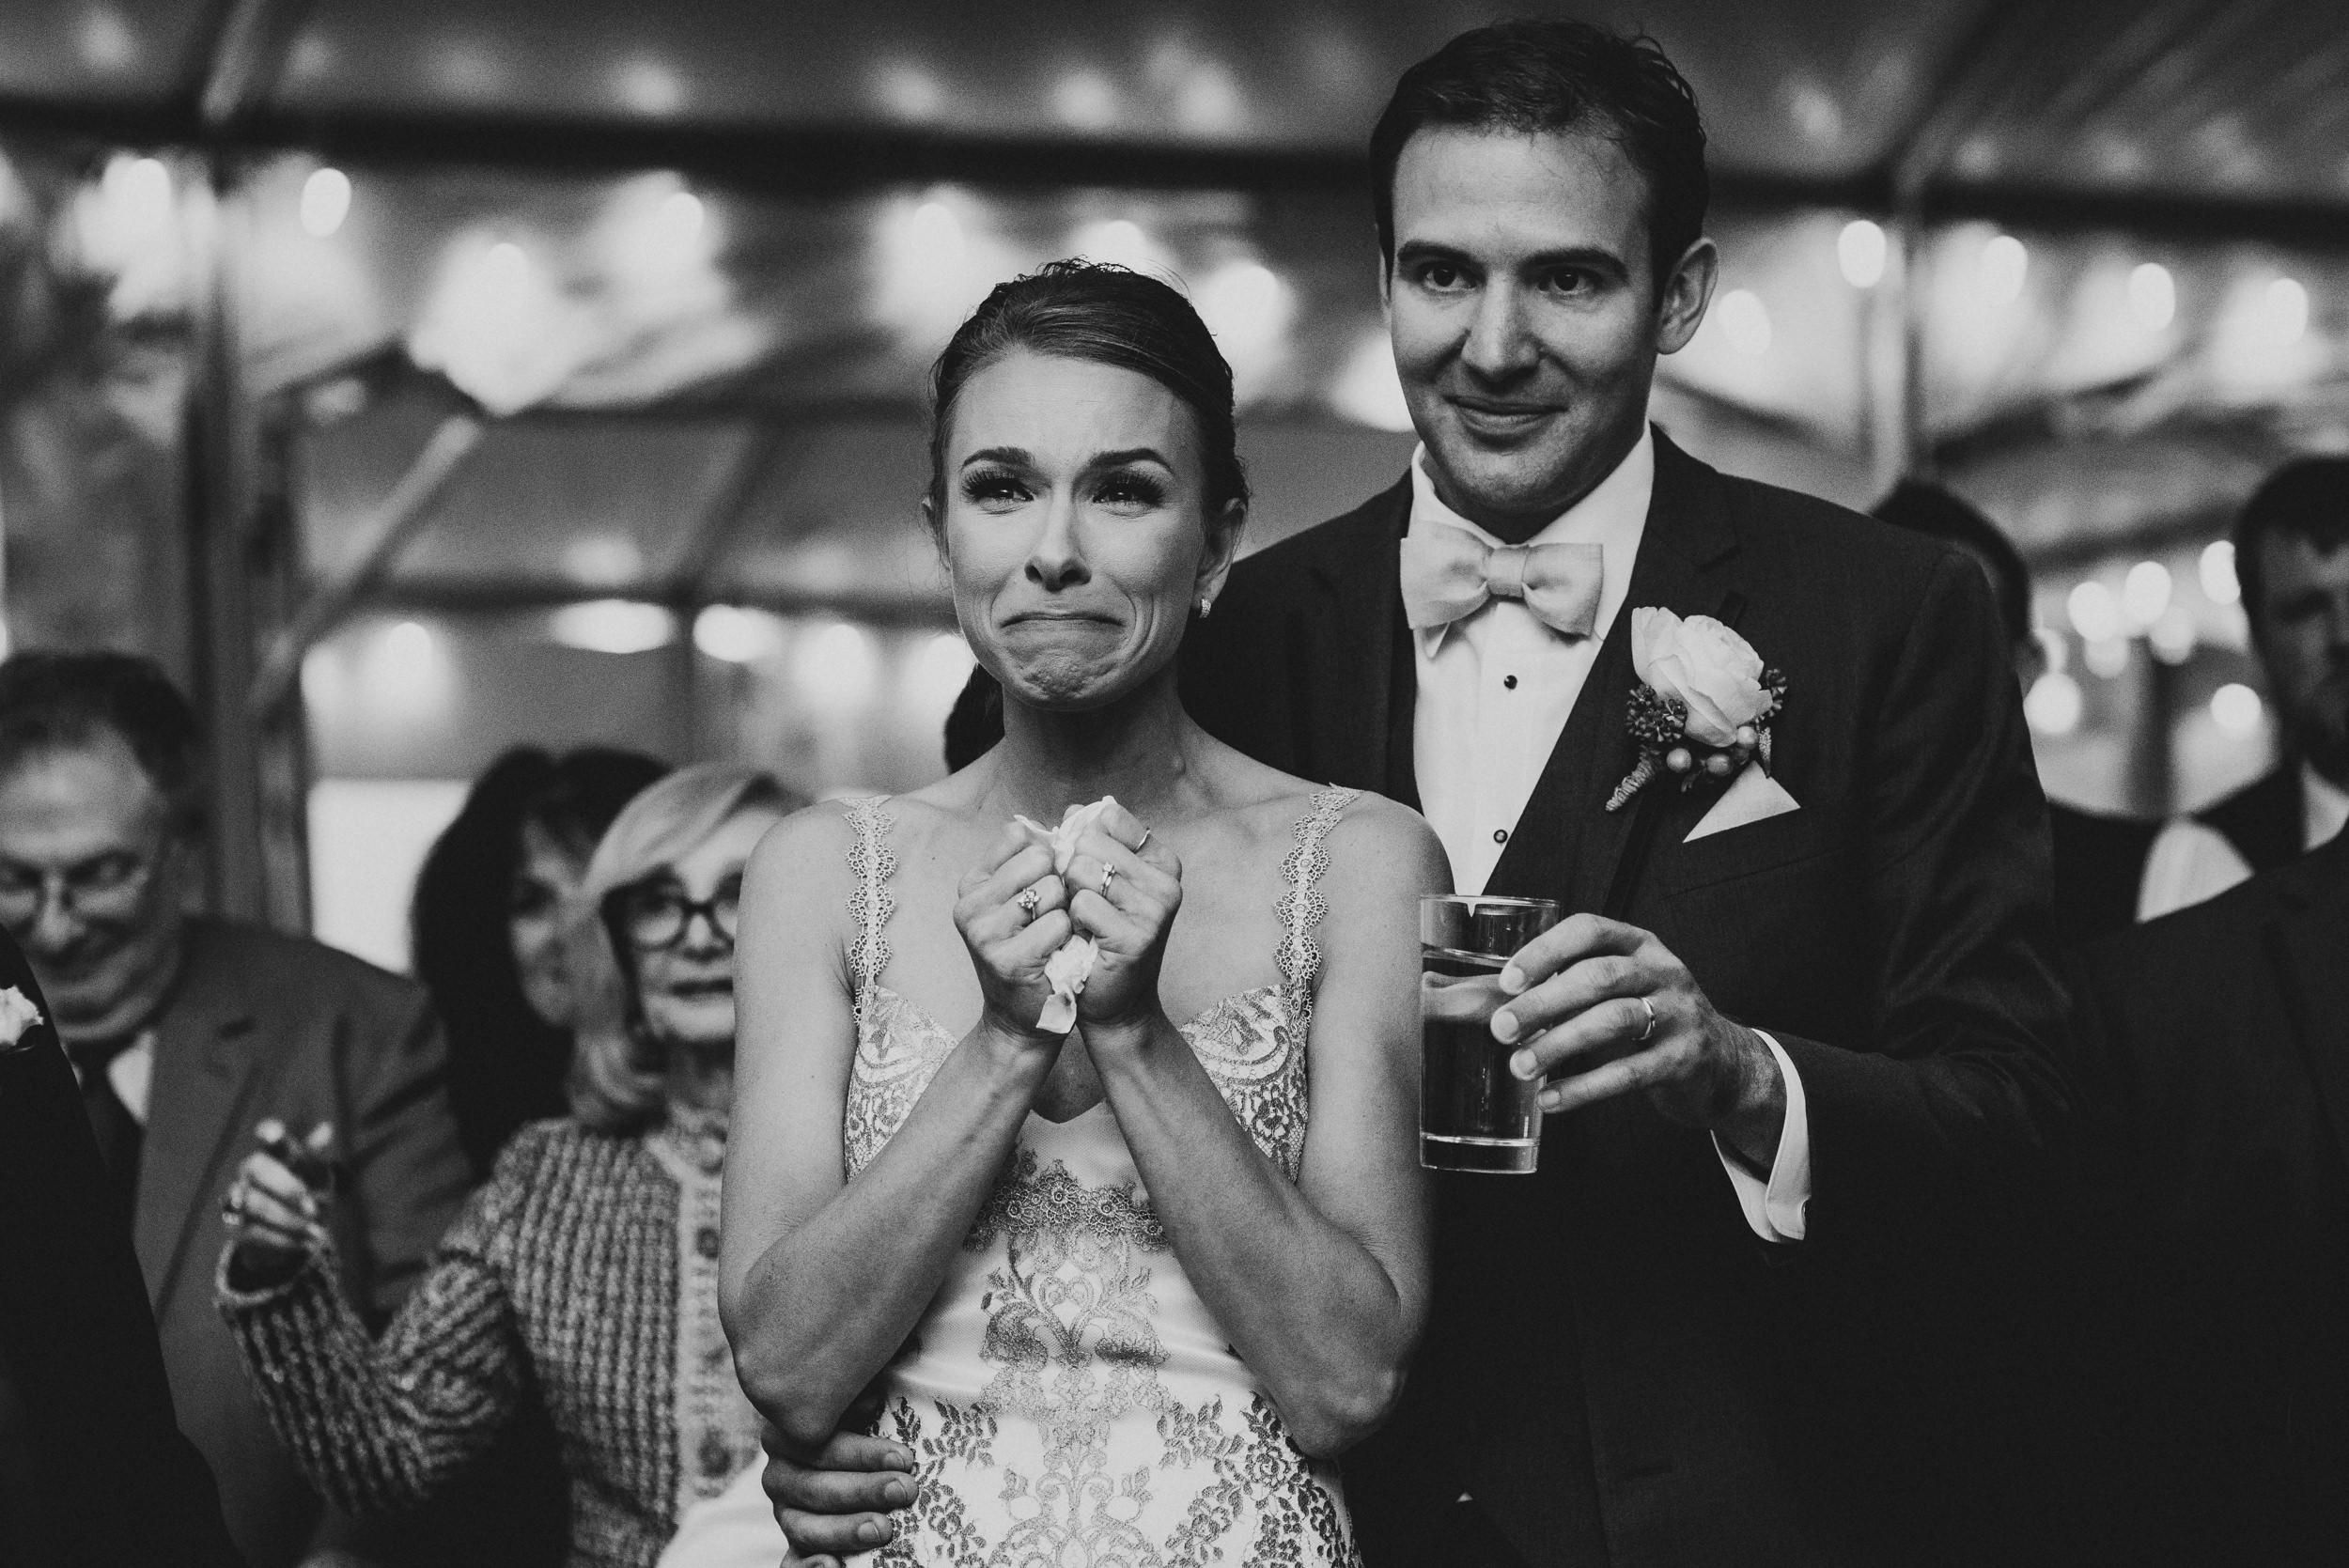 Philip Merrill Environmental Center wedding-25.jpg